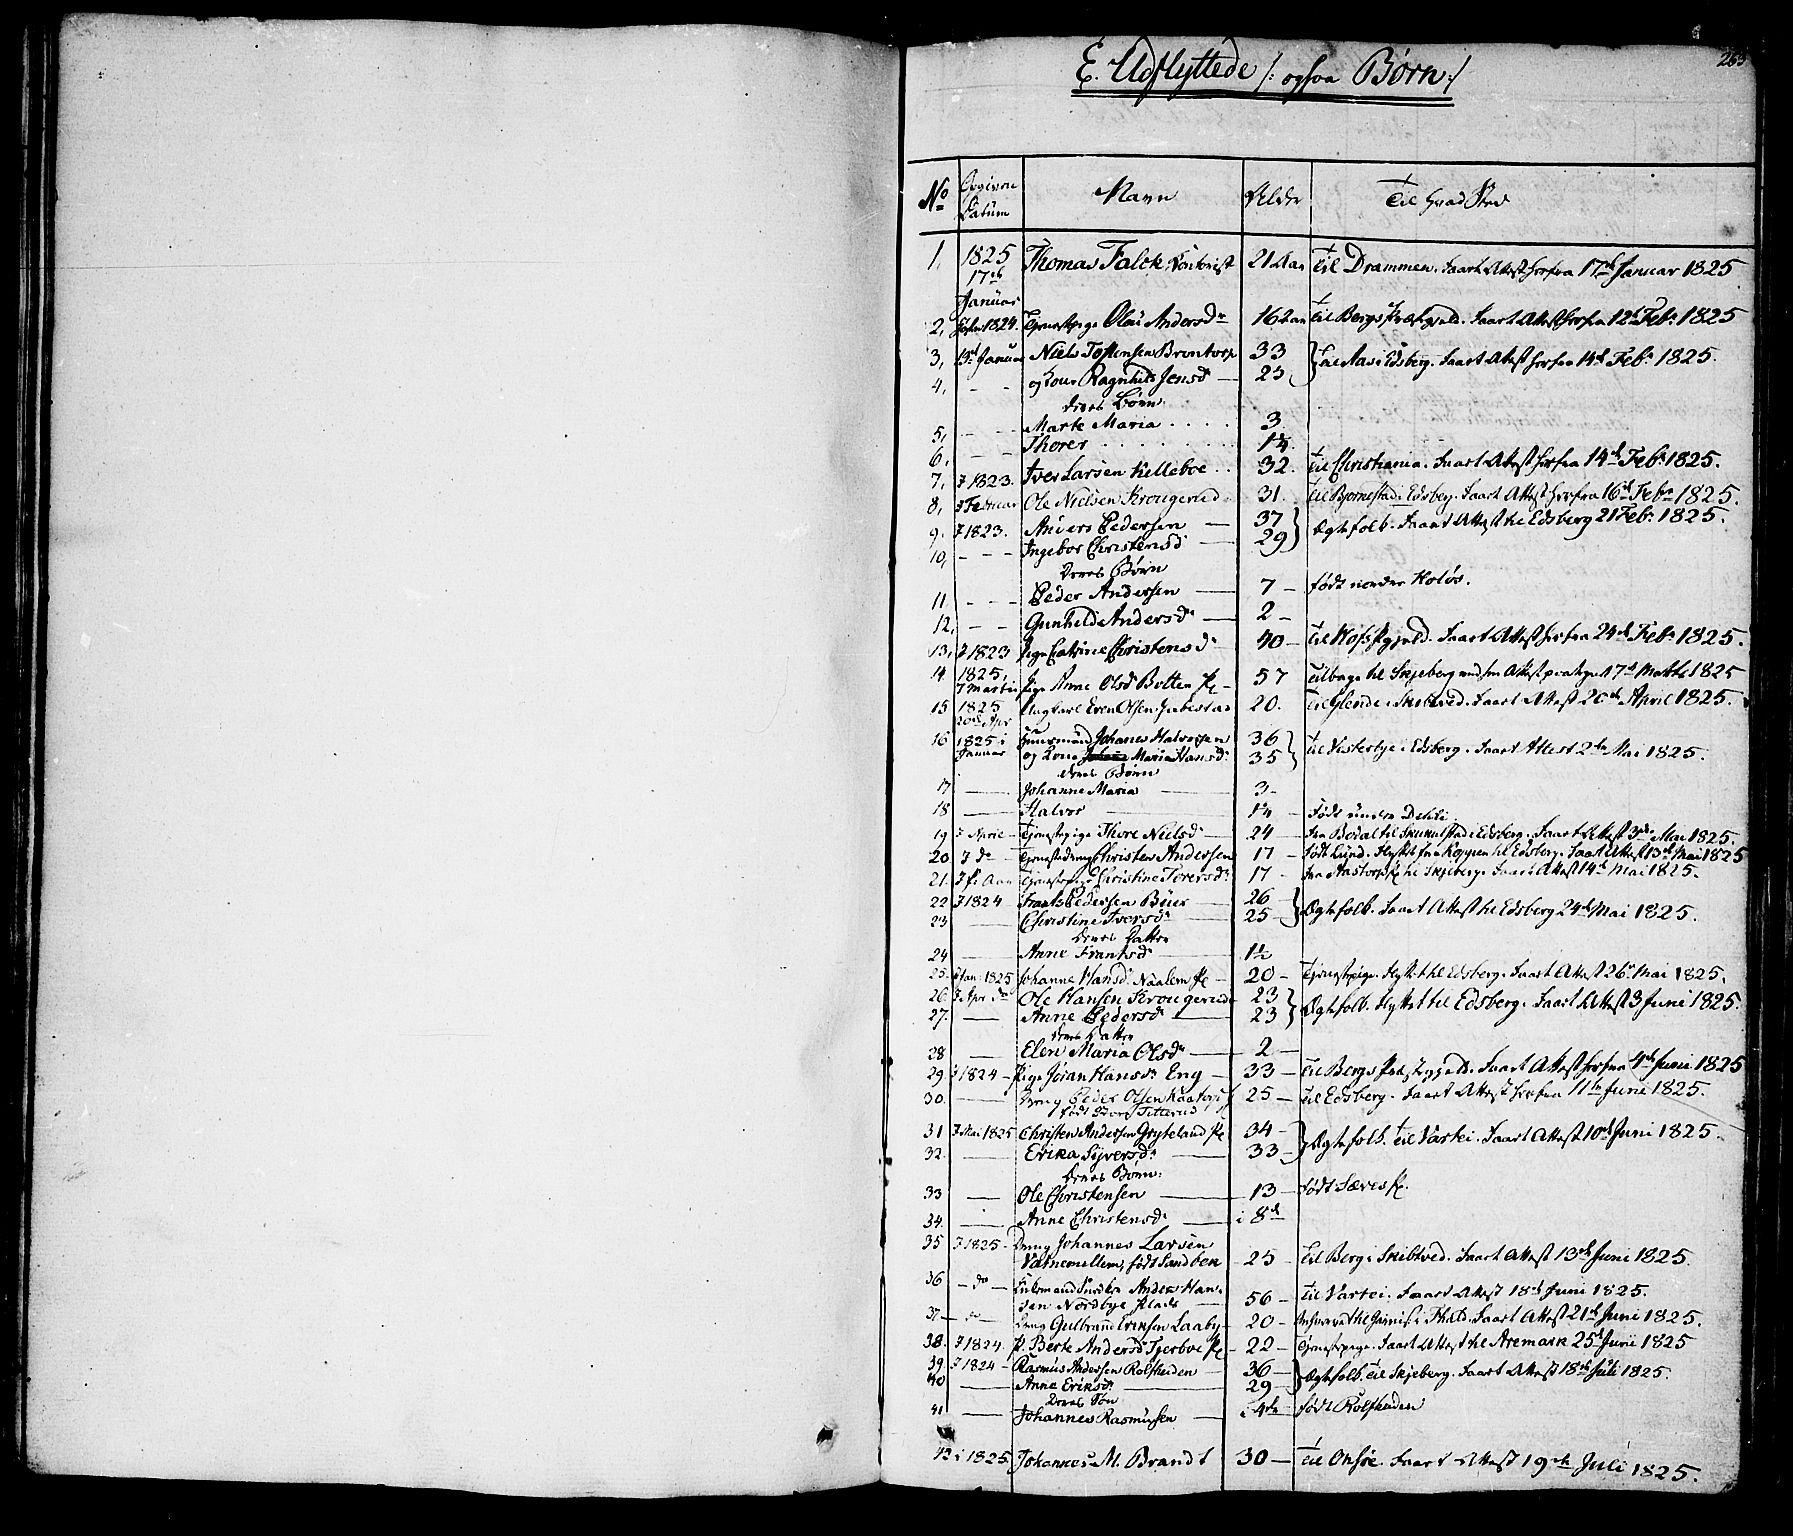 SAO, Rakkestad prestekontor Kirkebøker, F/Fa/L0007: Ministerialbok nr. I 7, 1825-1841, s. 263